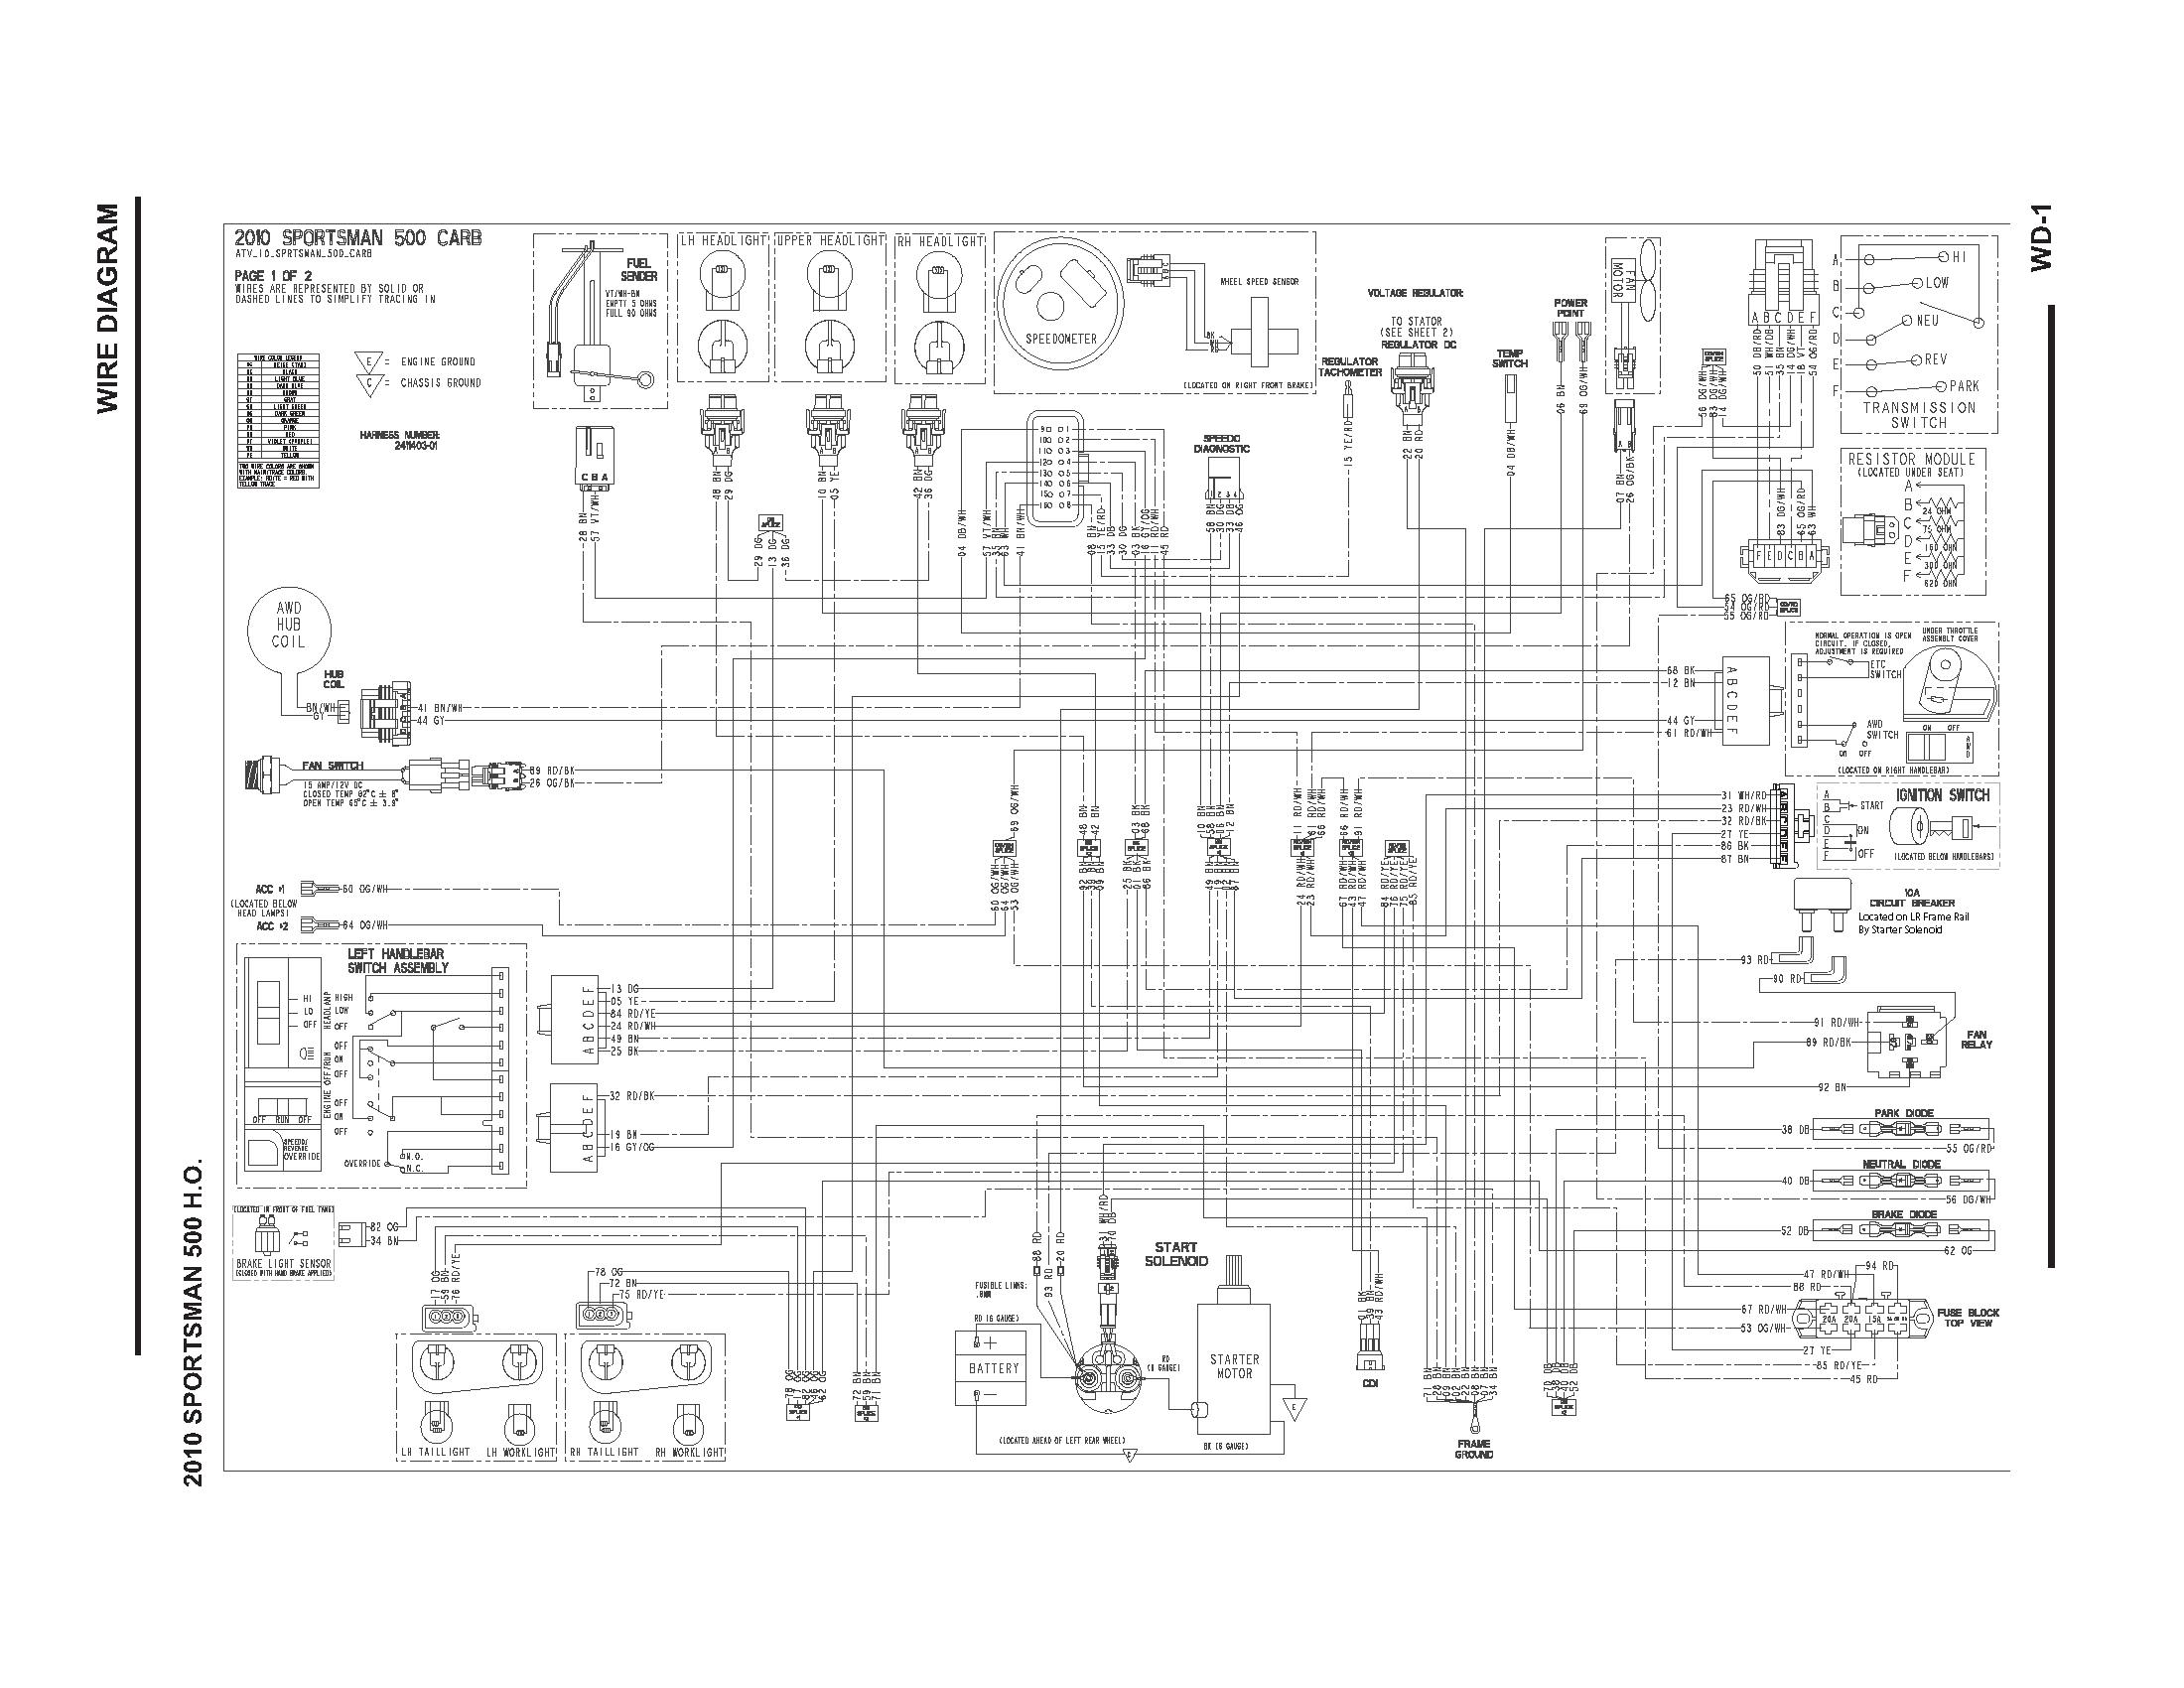 2002 Polaris Sportsman 500 Wiring Diagram Pdf